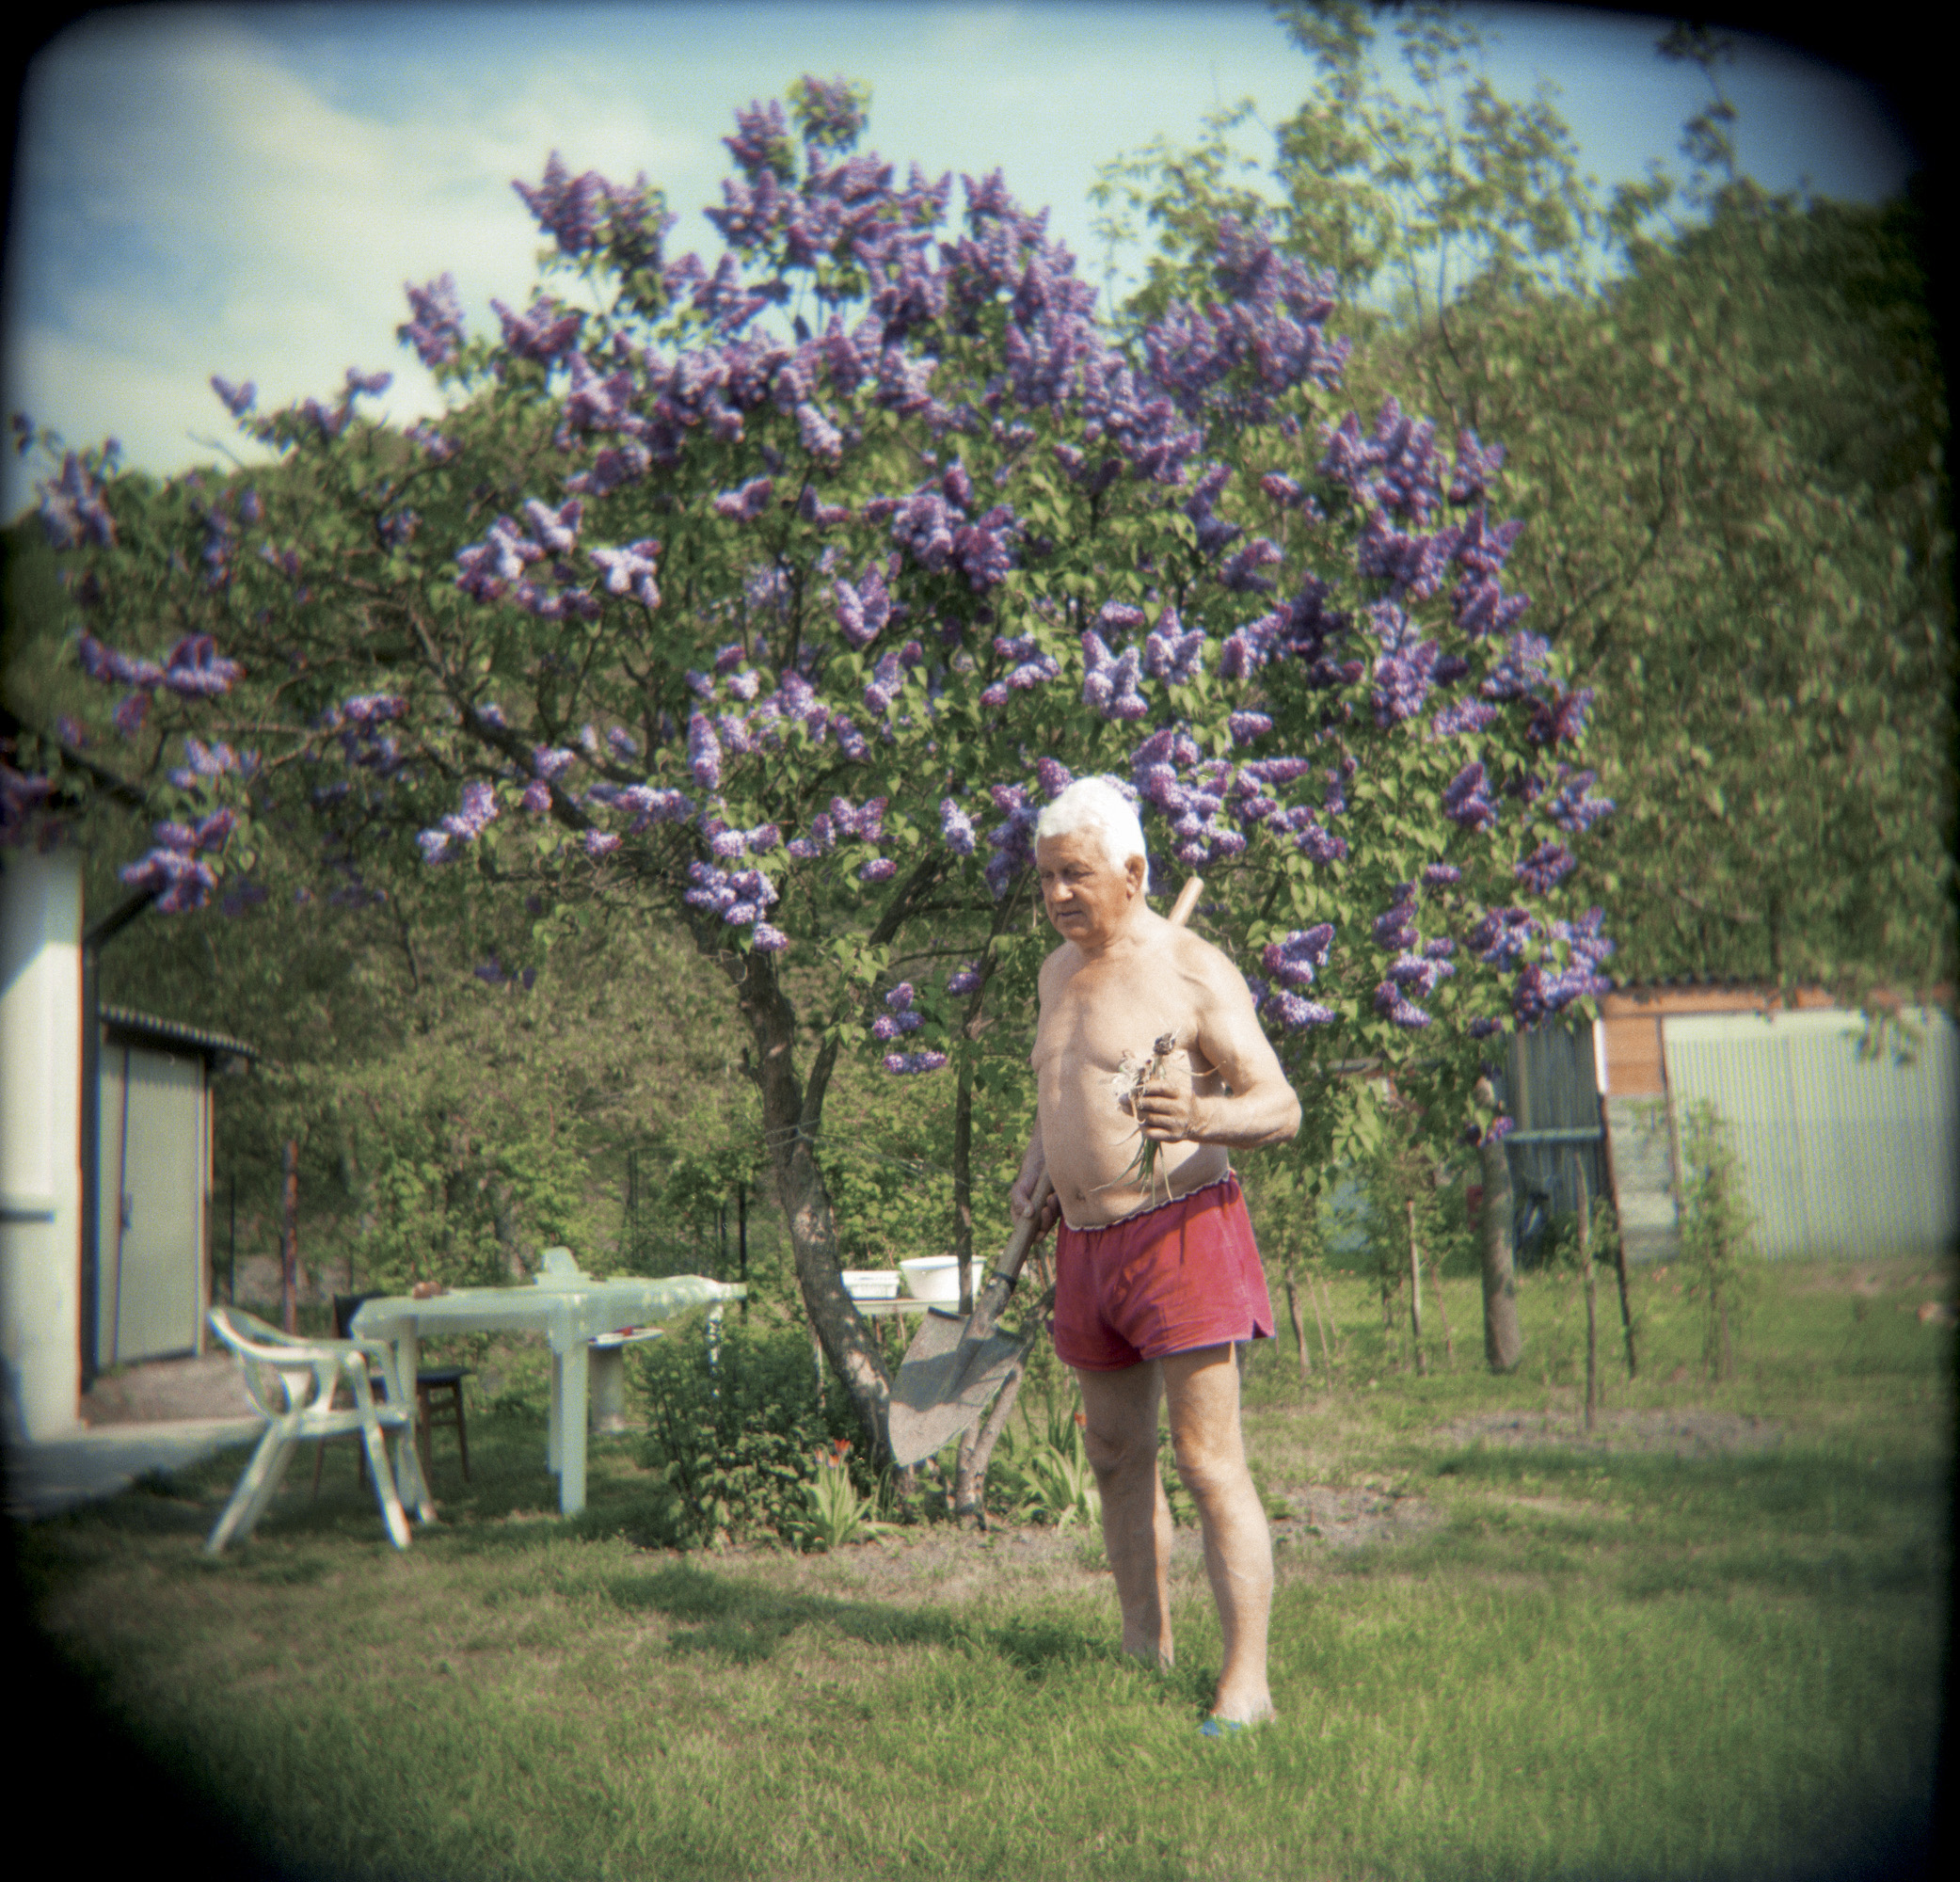 sundays-of-life-bela-doka-23.jpg